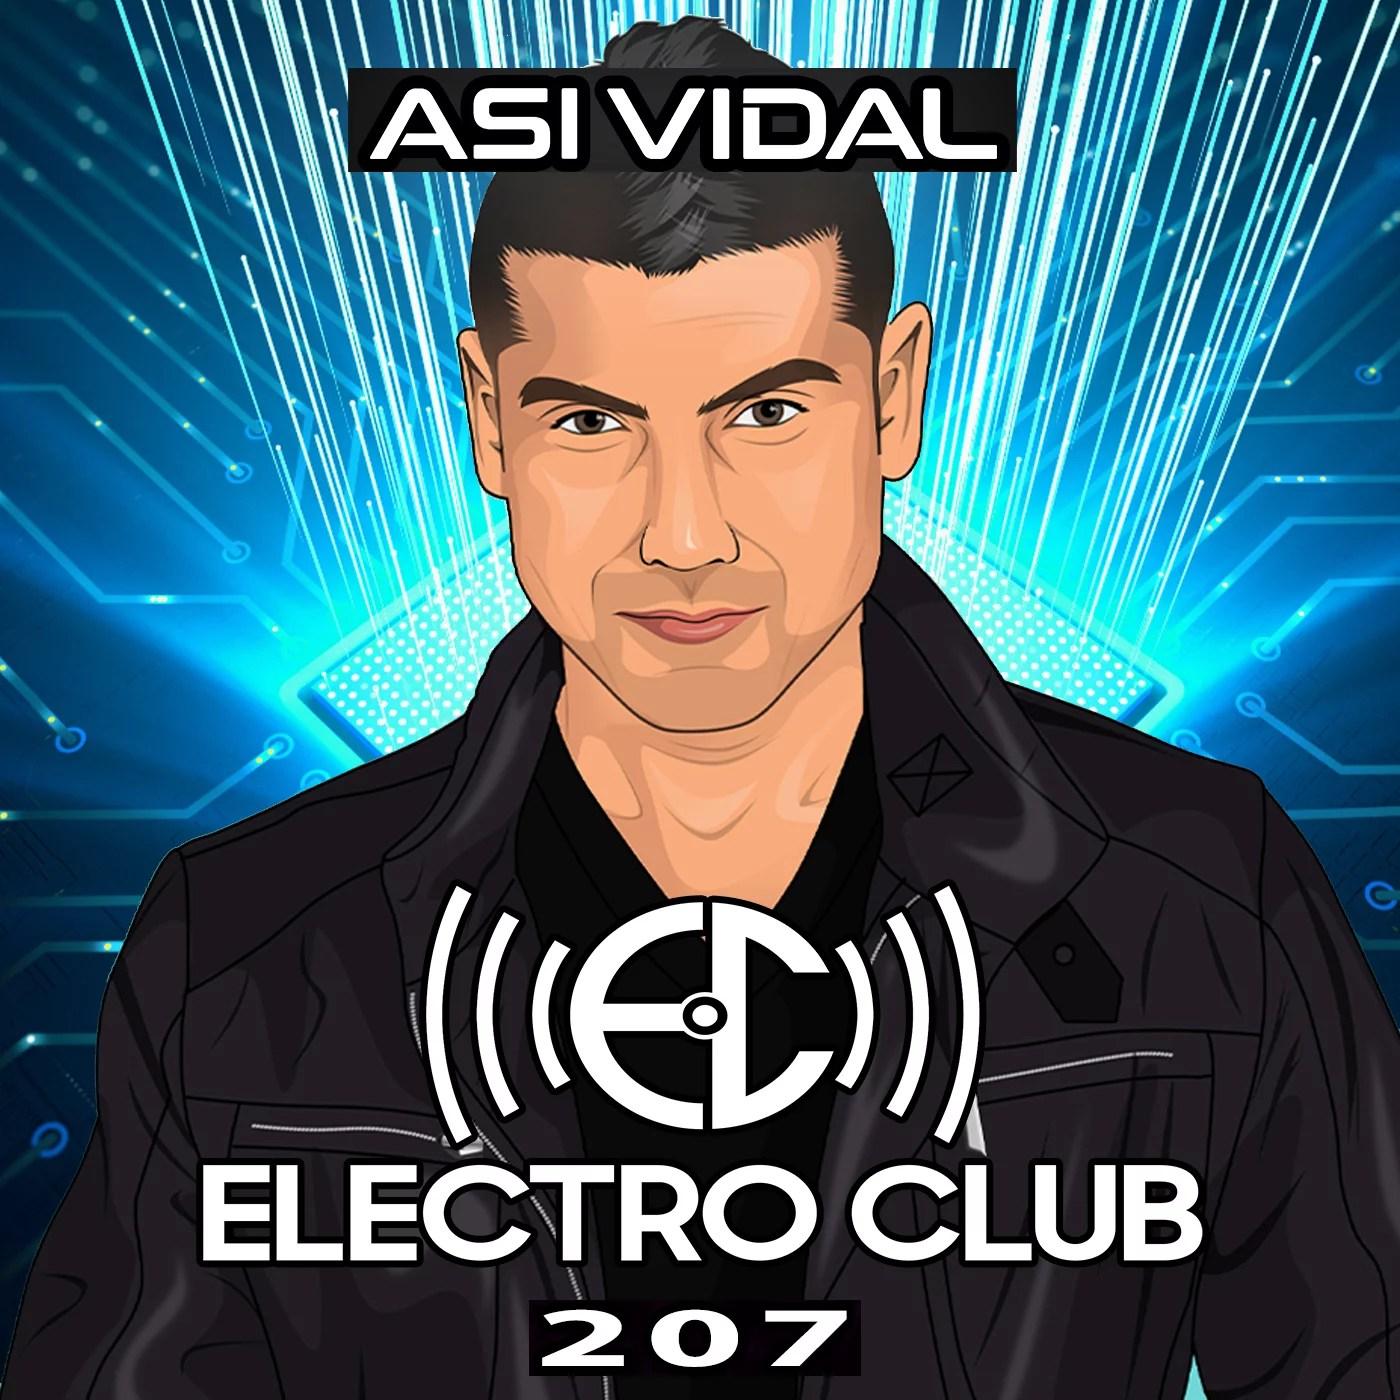 Asi Vidal electro club 207